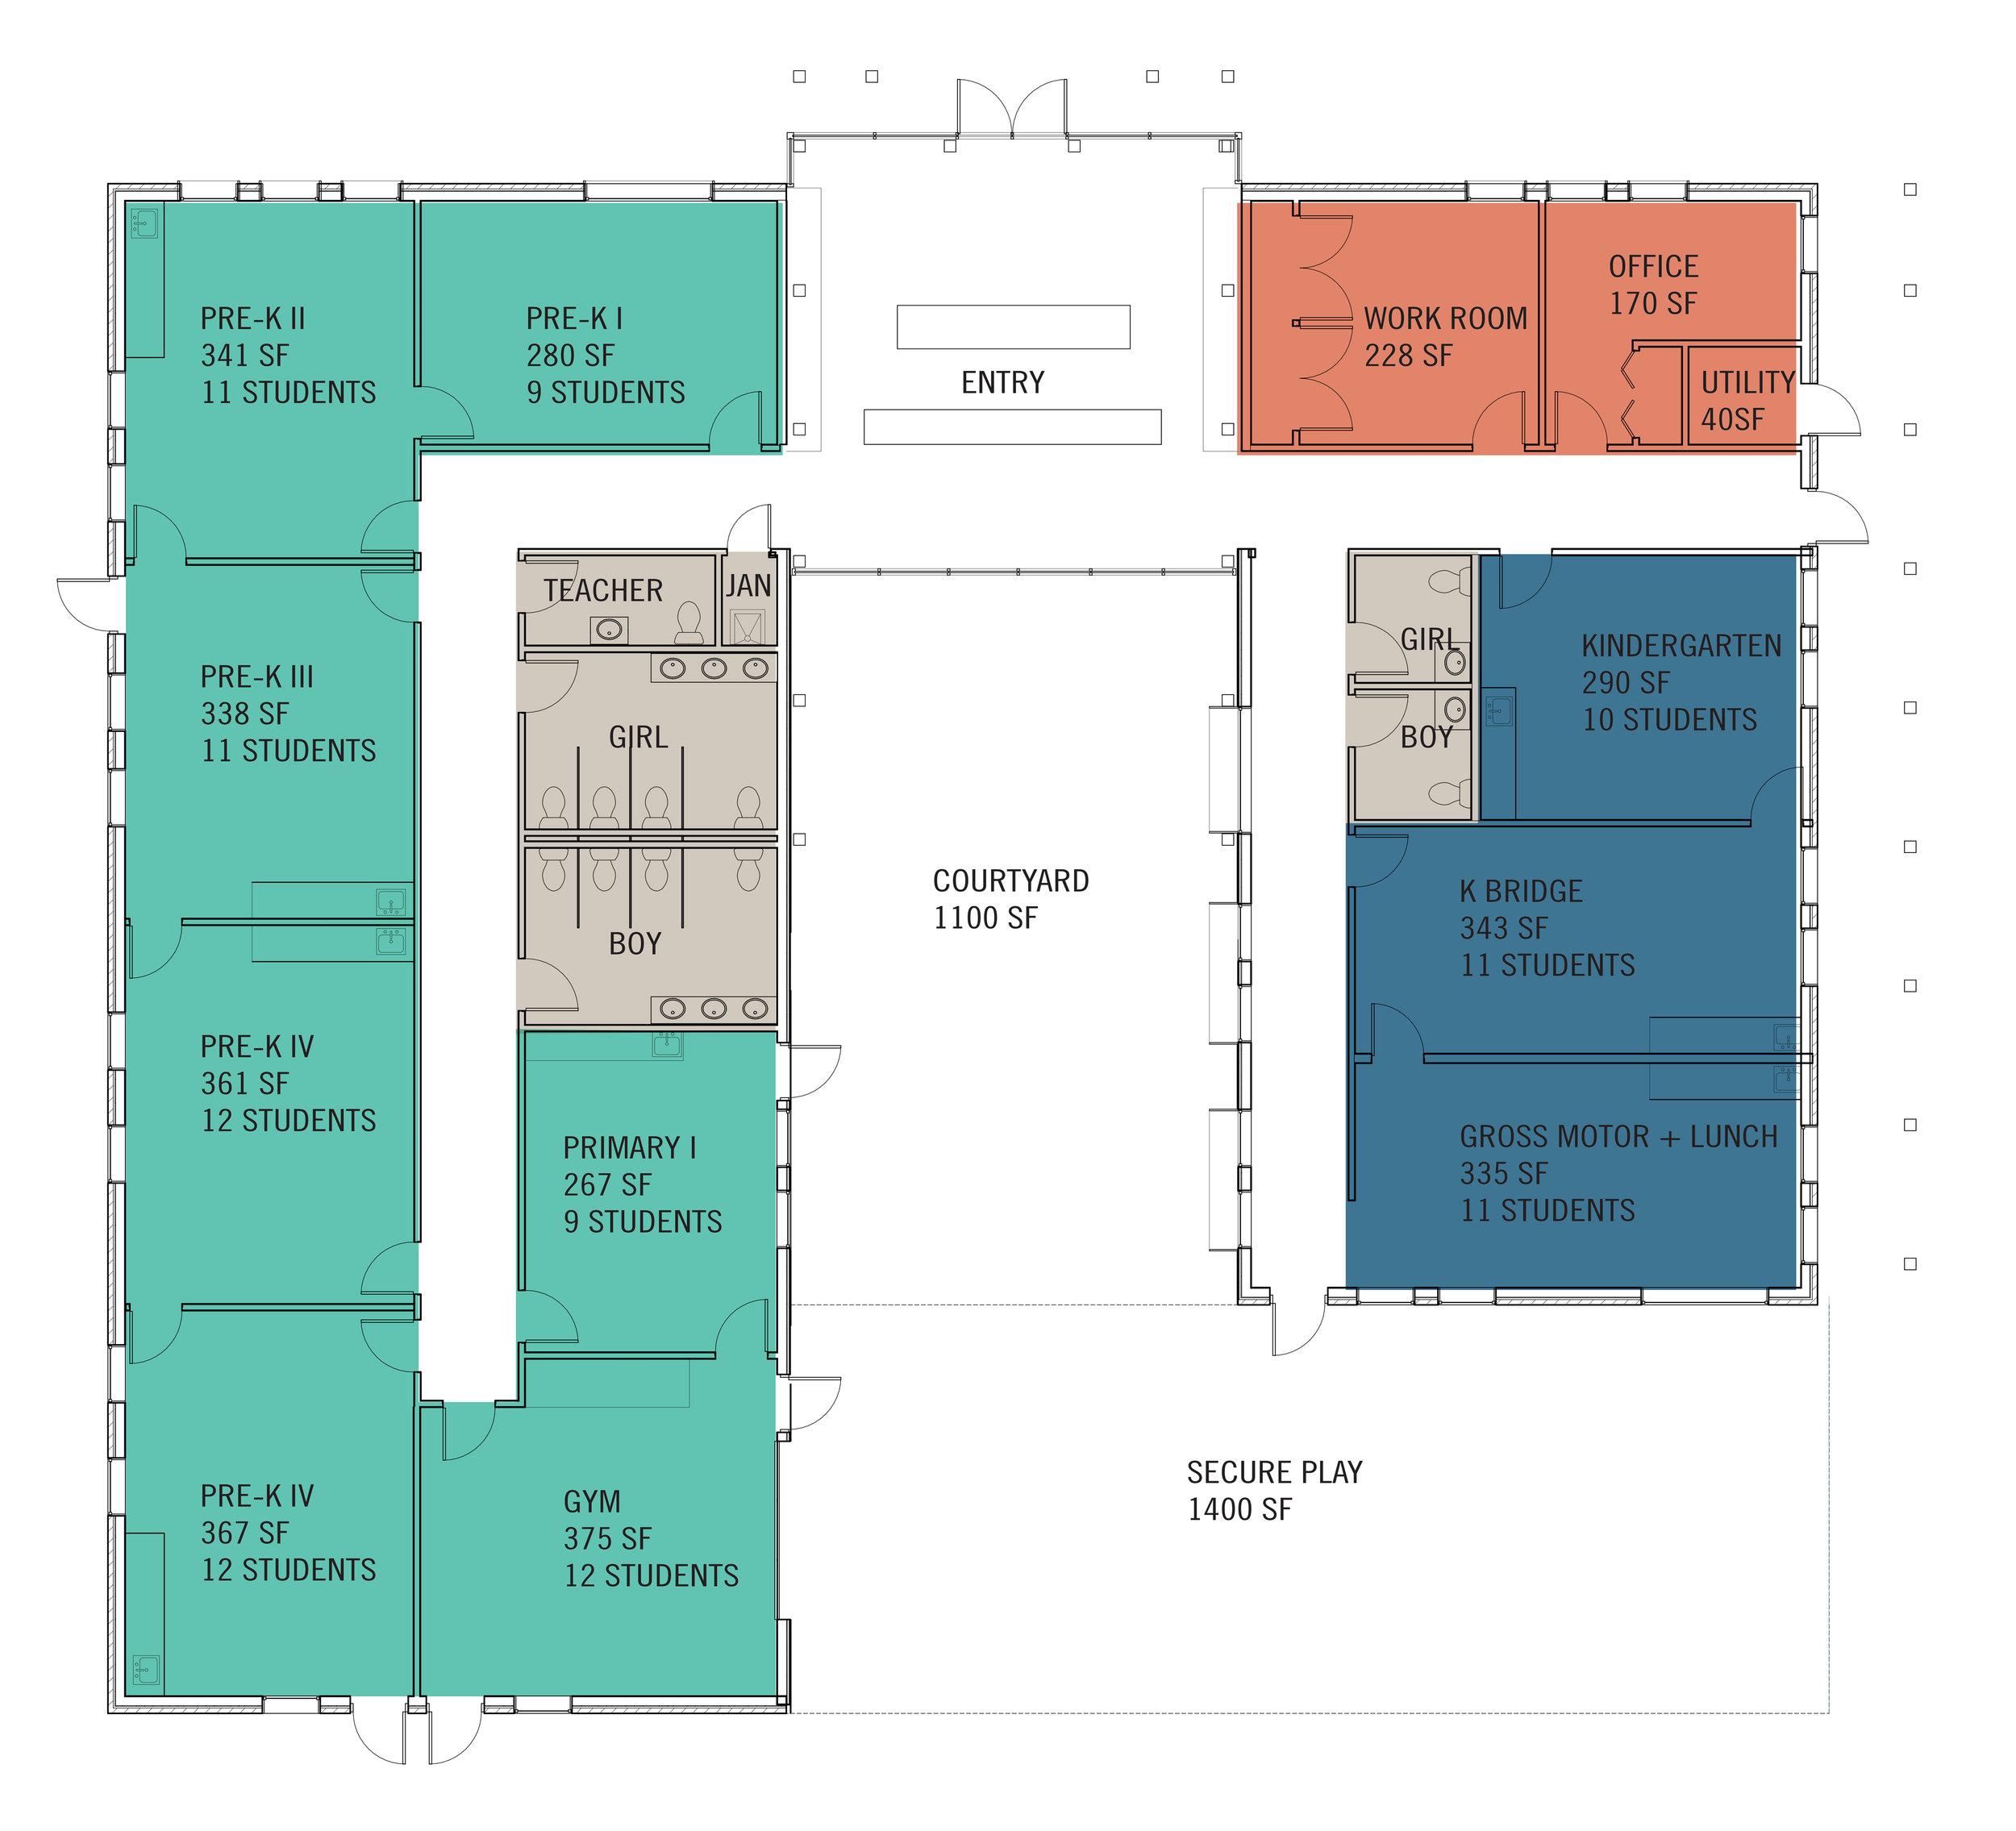 171011-Floor-Plan---Color.jpg